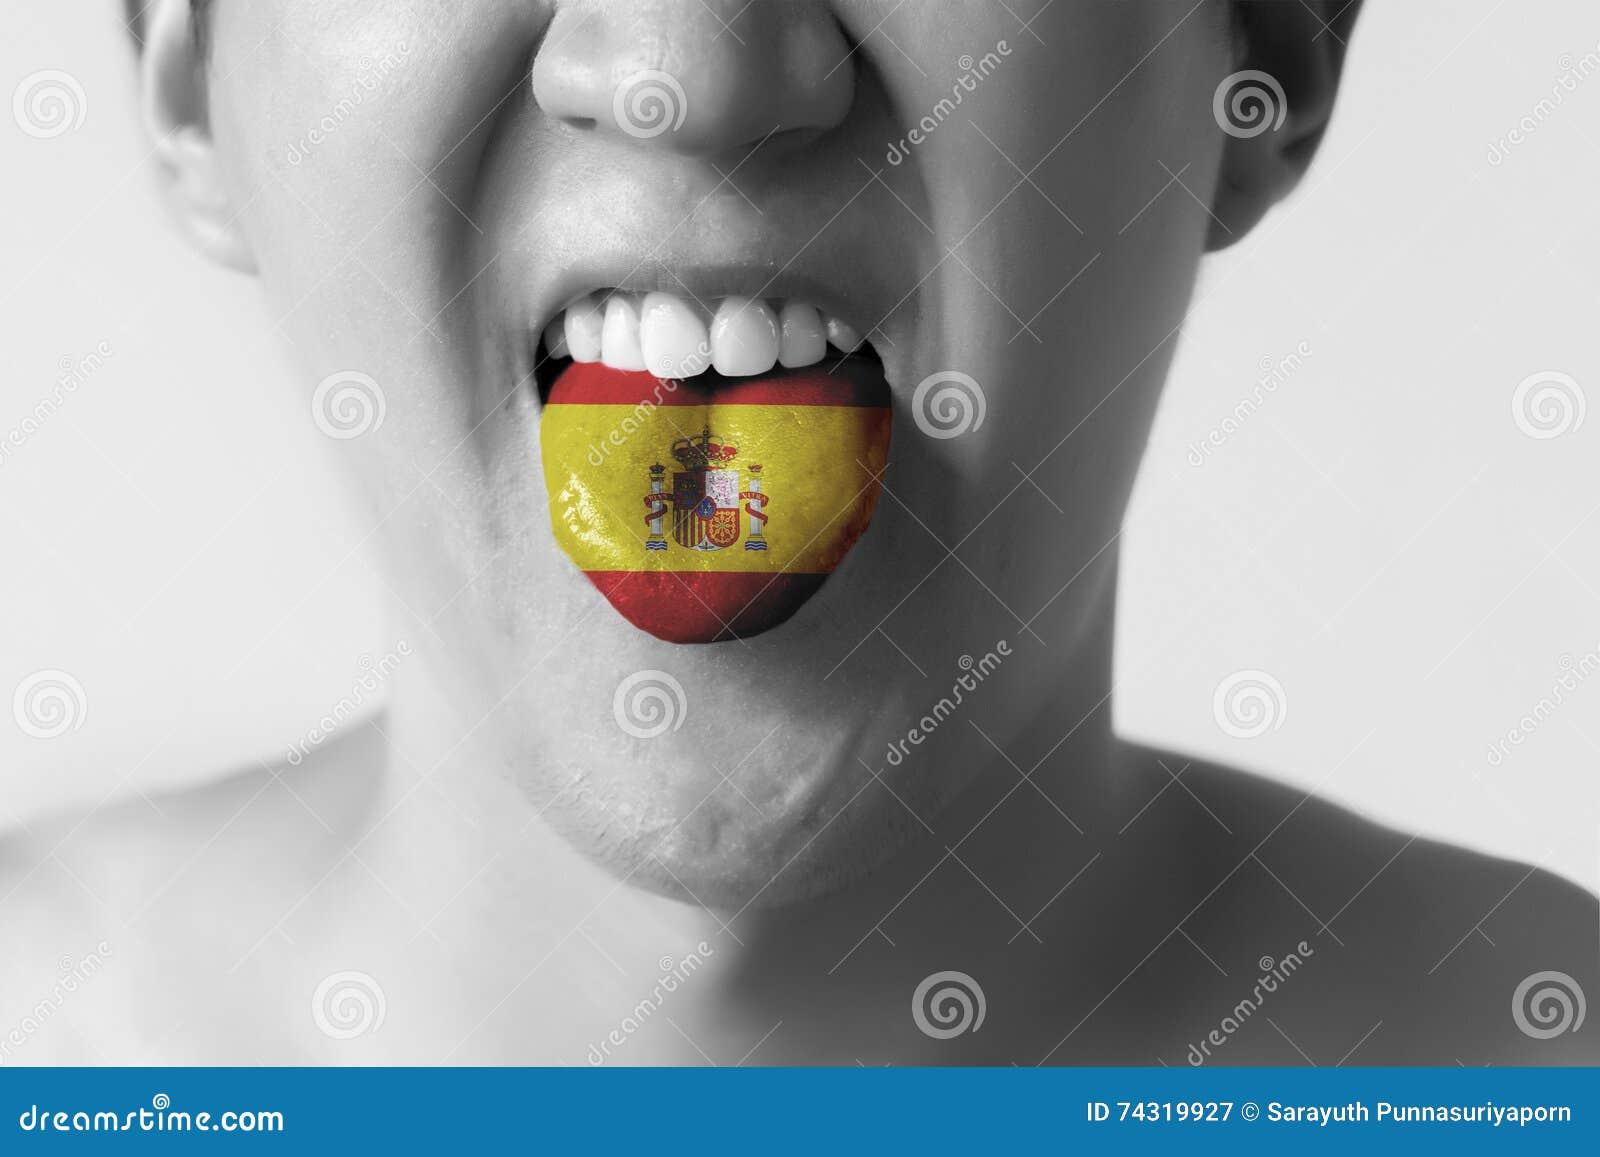 Espagne sexe de l'adolescence Bella Reese pipe